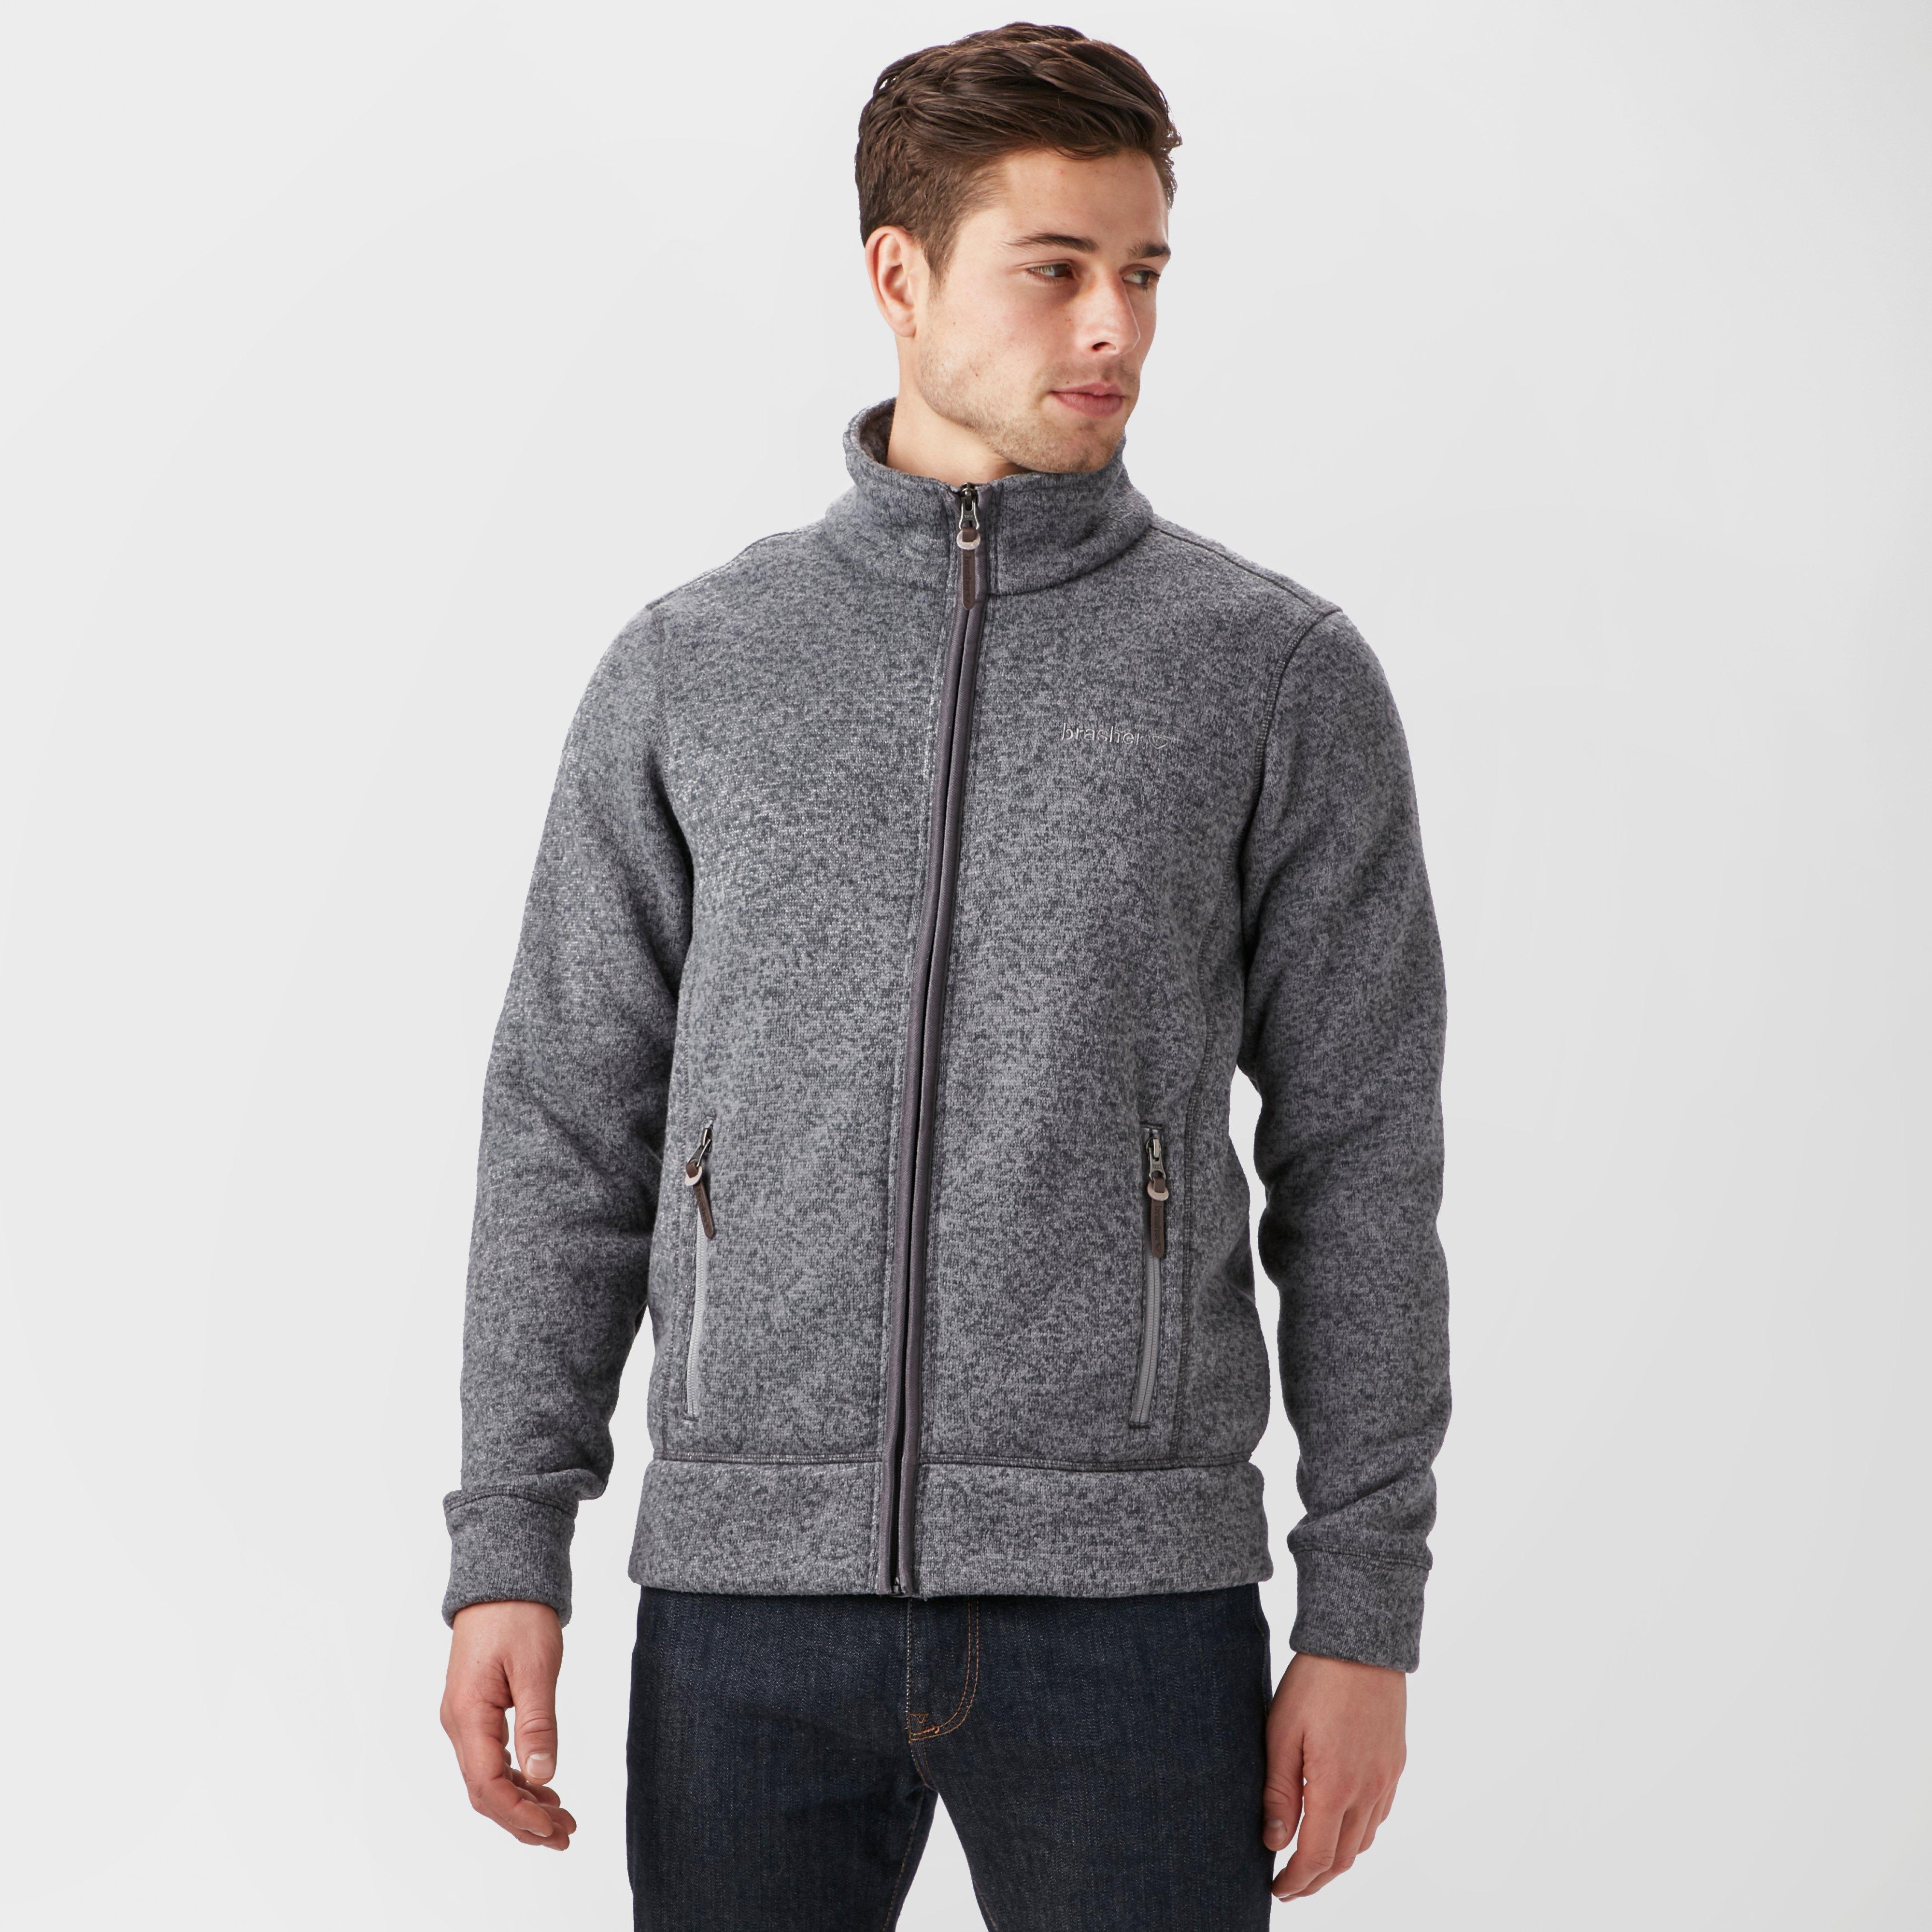 Brasher Brasher Mens Rydal II Fleece Jacket - Grey, Grey